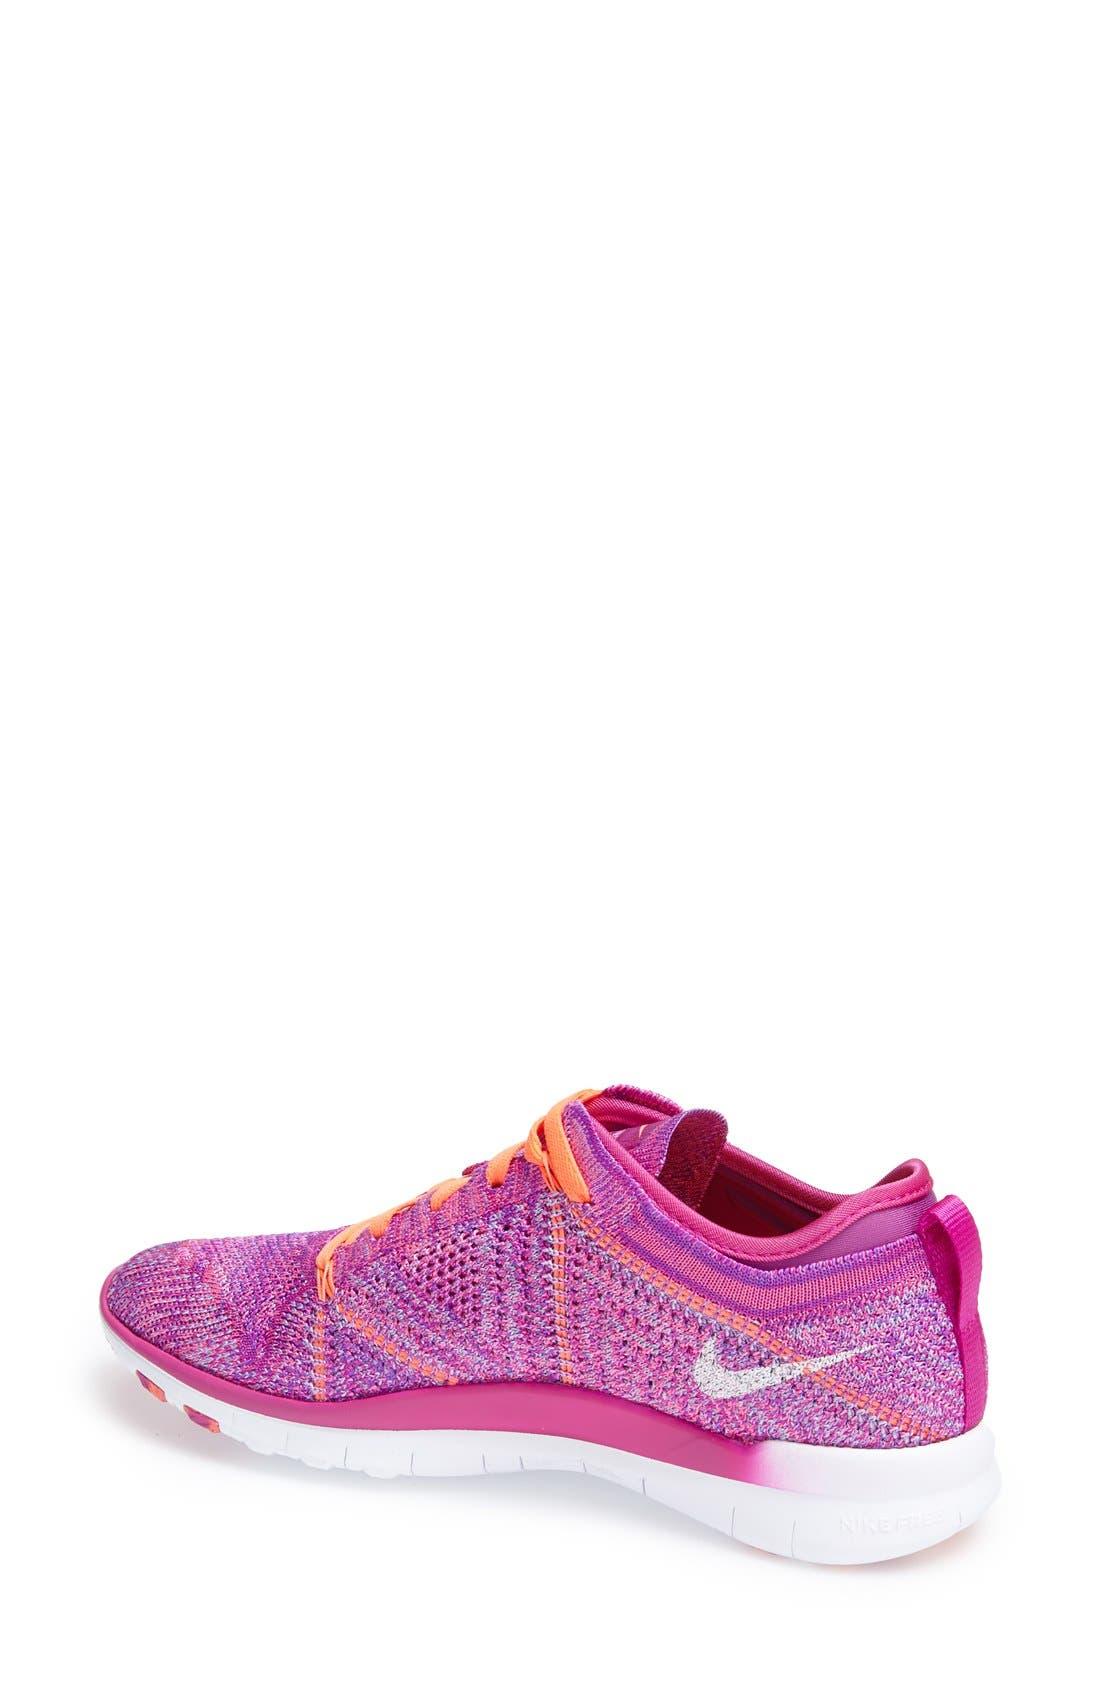 ,                             'Free Flyknit 5.0 TR' Training Shoe,                             Alternate thumbnail 42, color,                             500